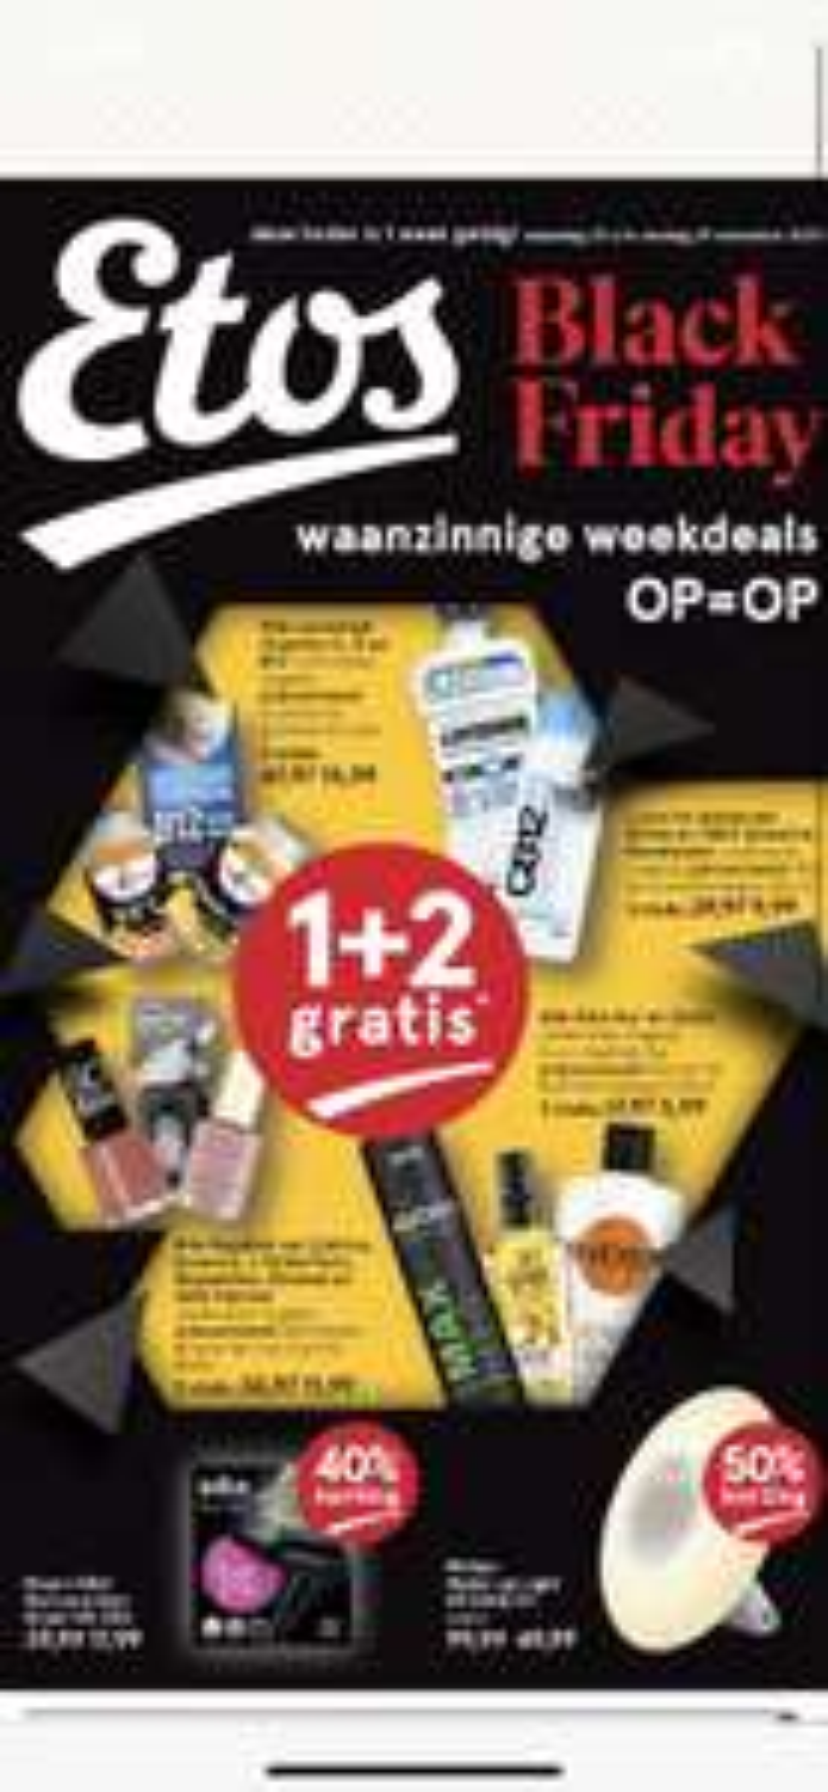 Black Friday deals: 1+2 gratis Etos